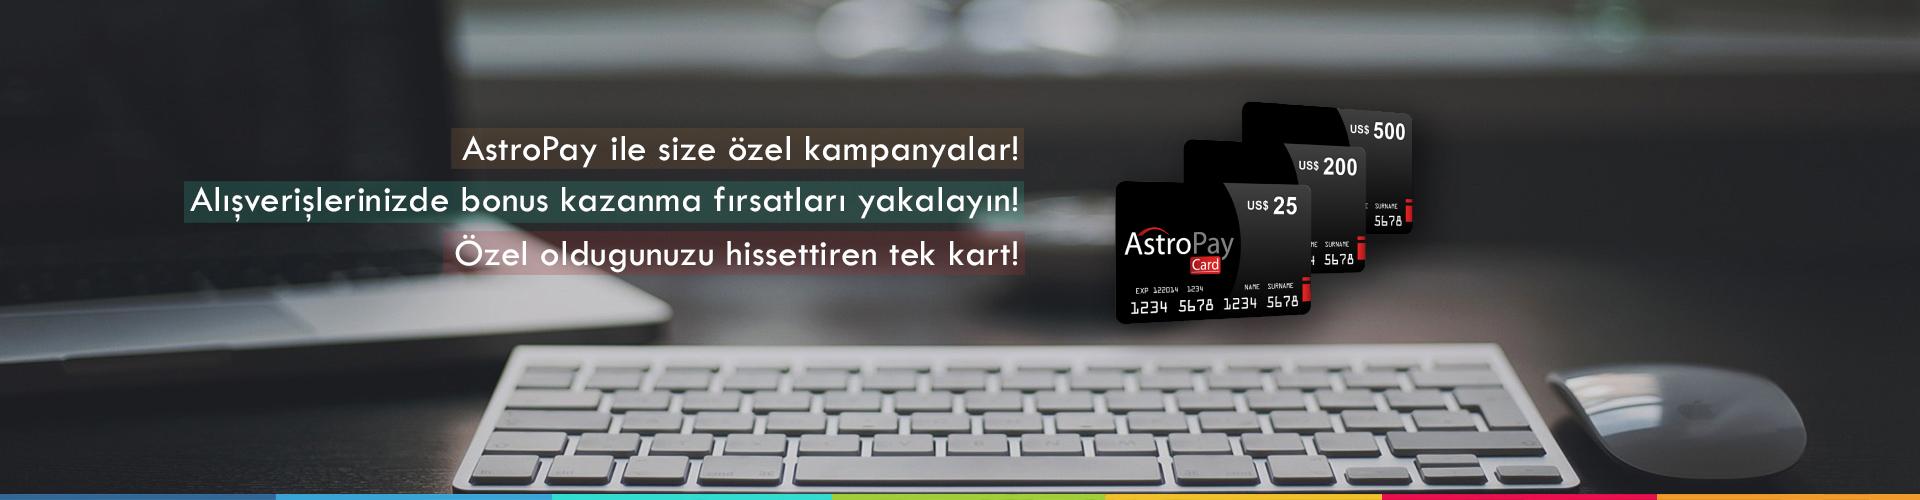 astropay-manset